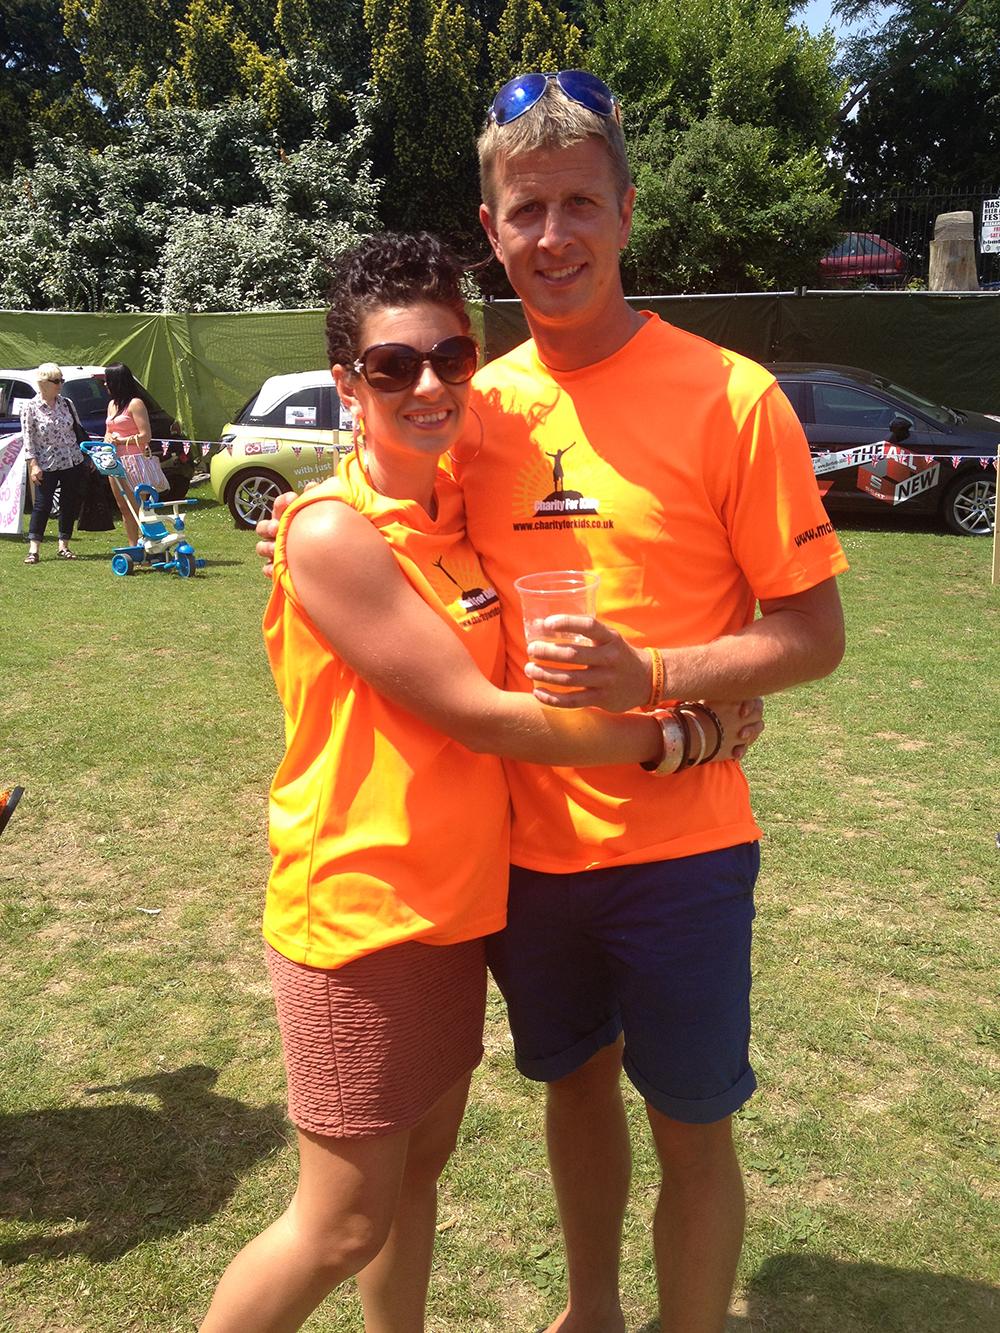 Chris-and-Sarah-Hastings-beer-Festival-2013